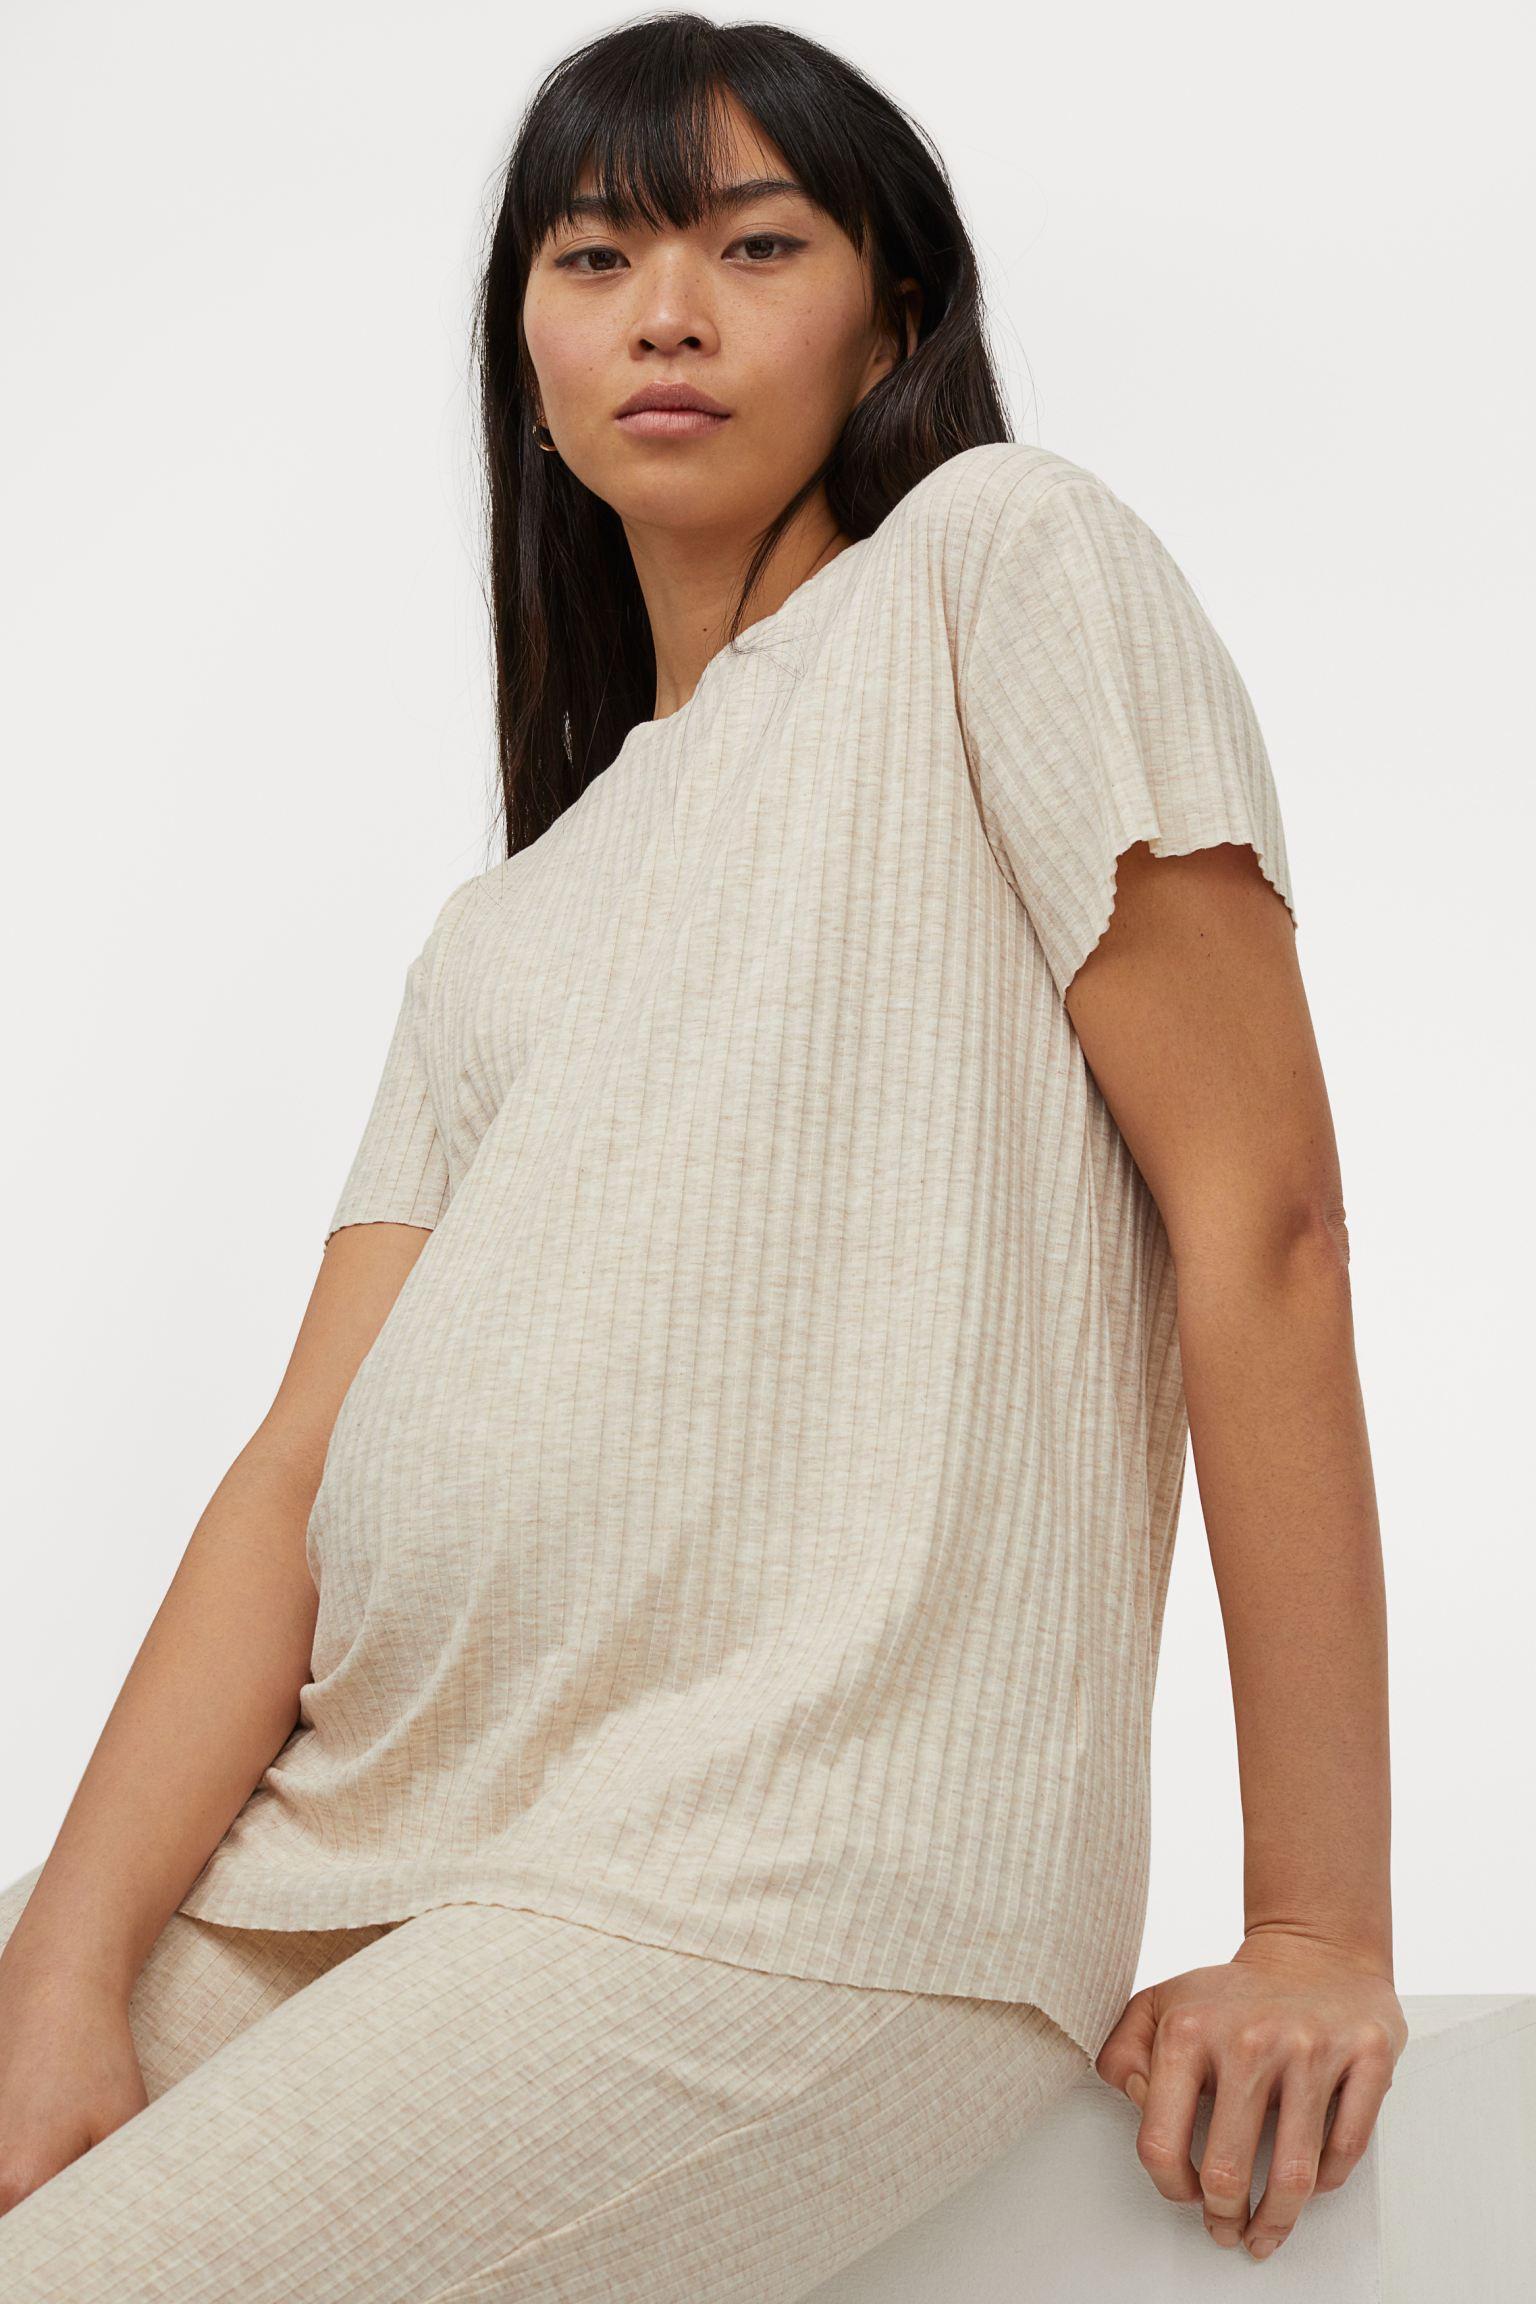 Camiseta beige de canalé